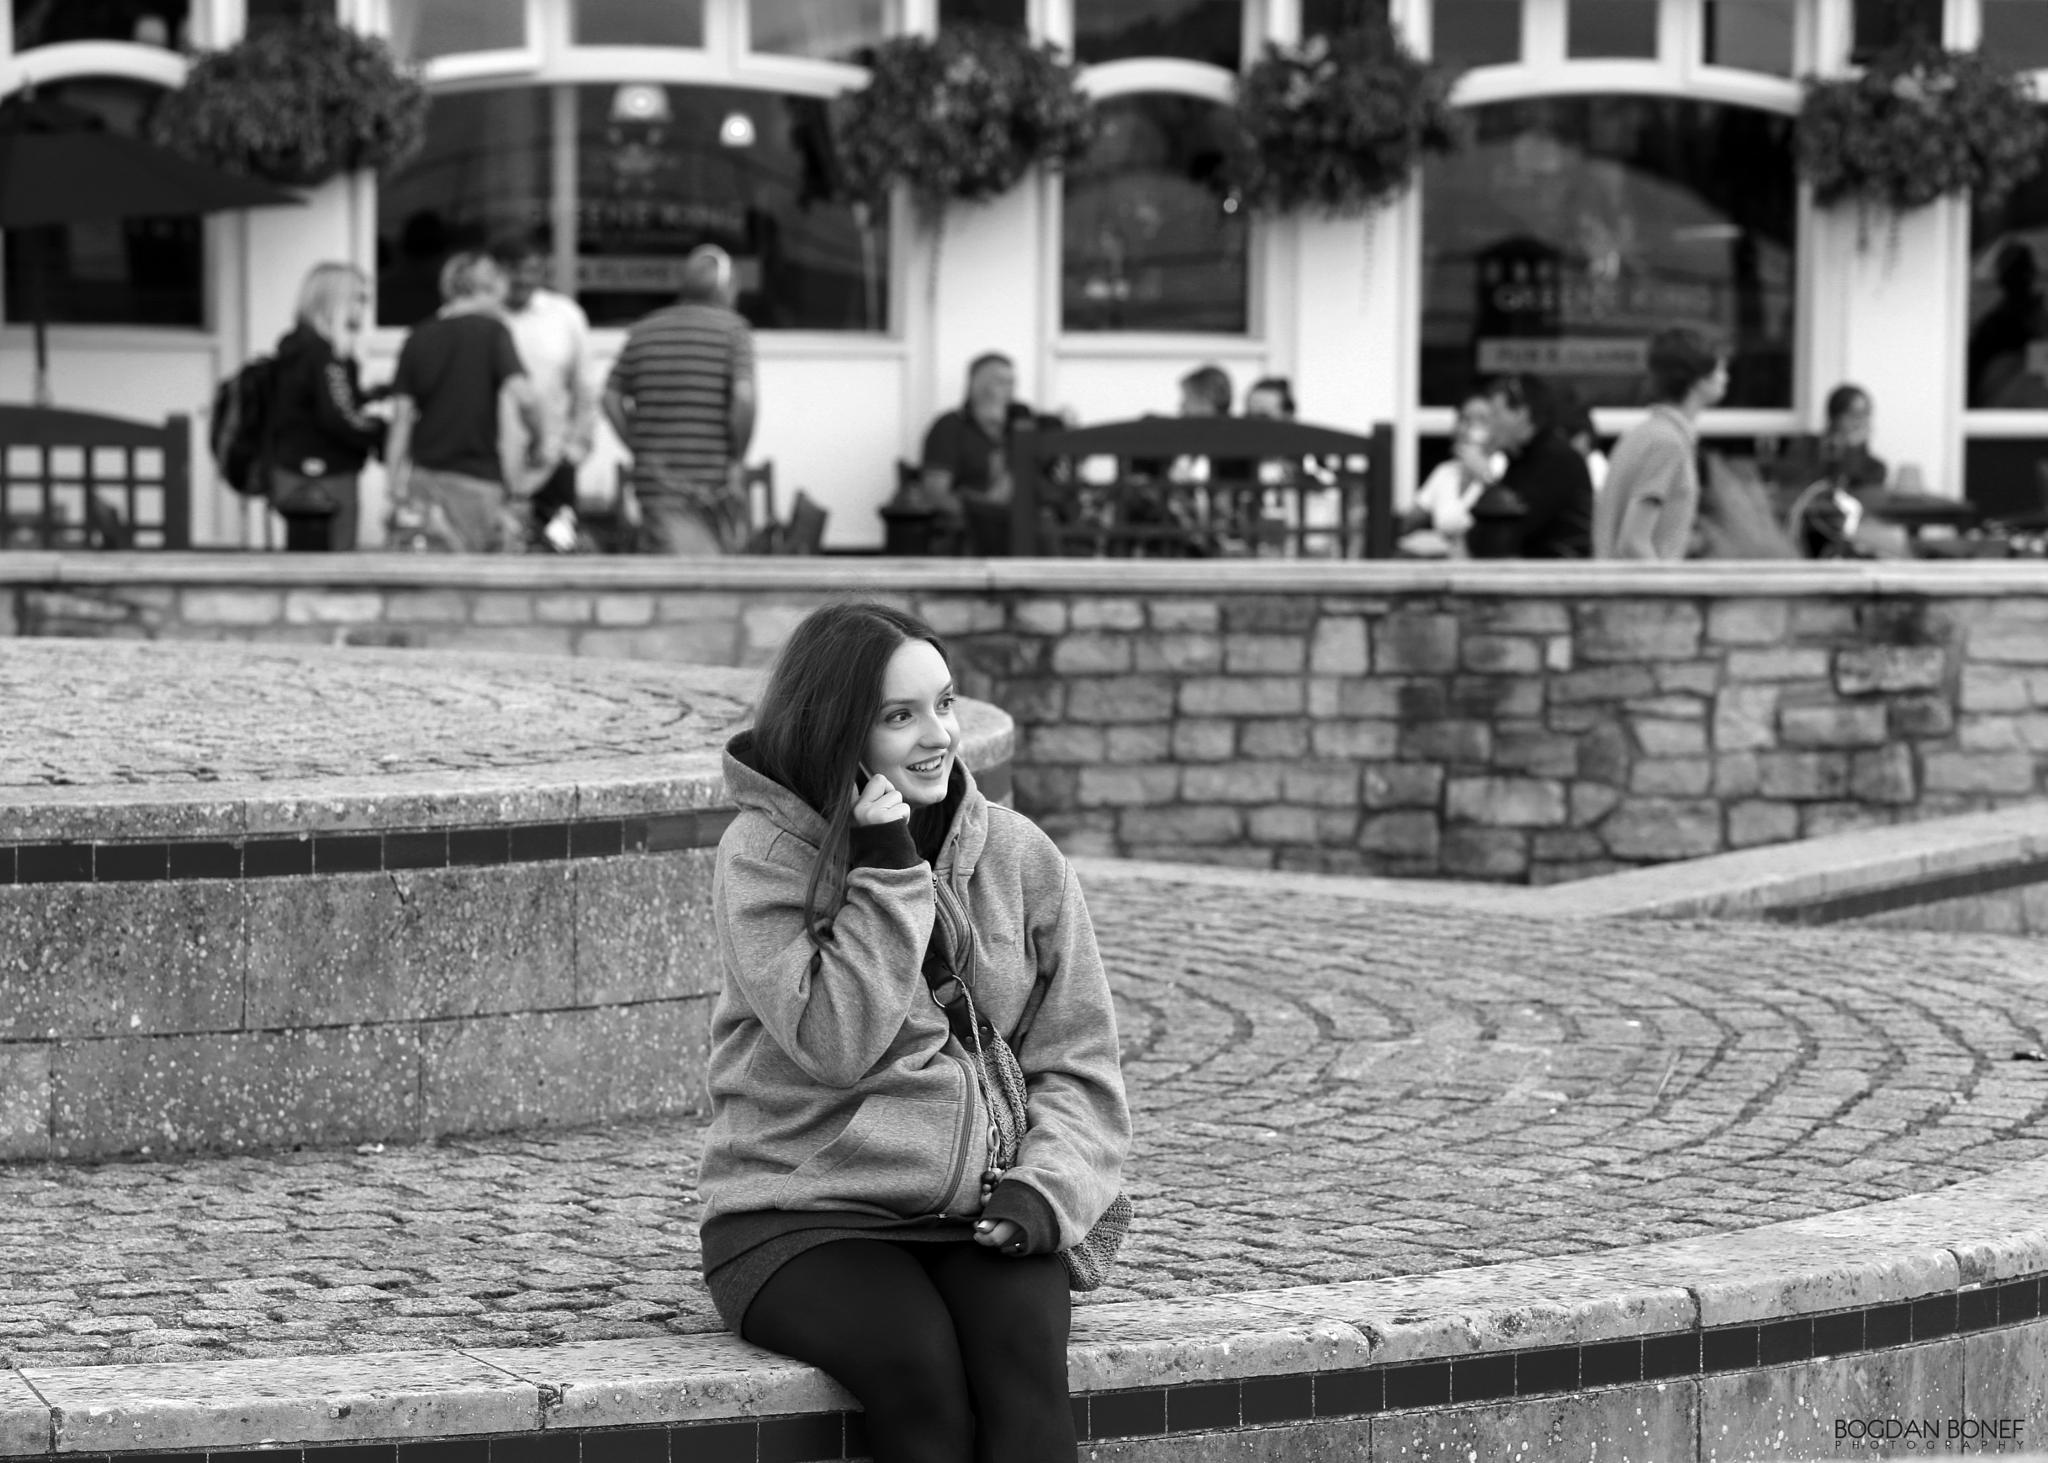 Chilly afternoon by Bogdan Bonef